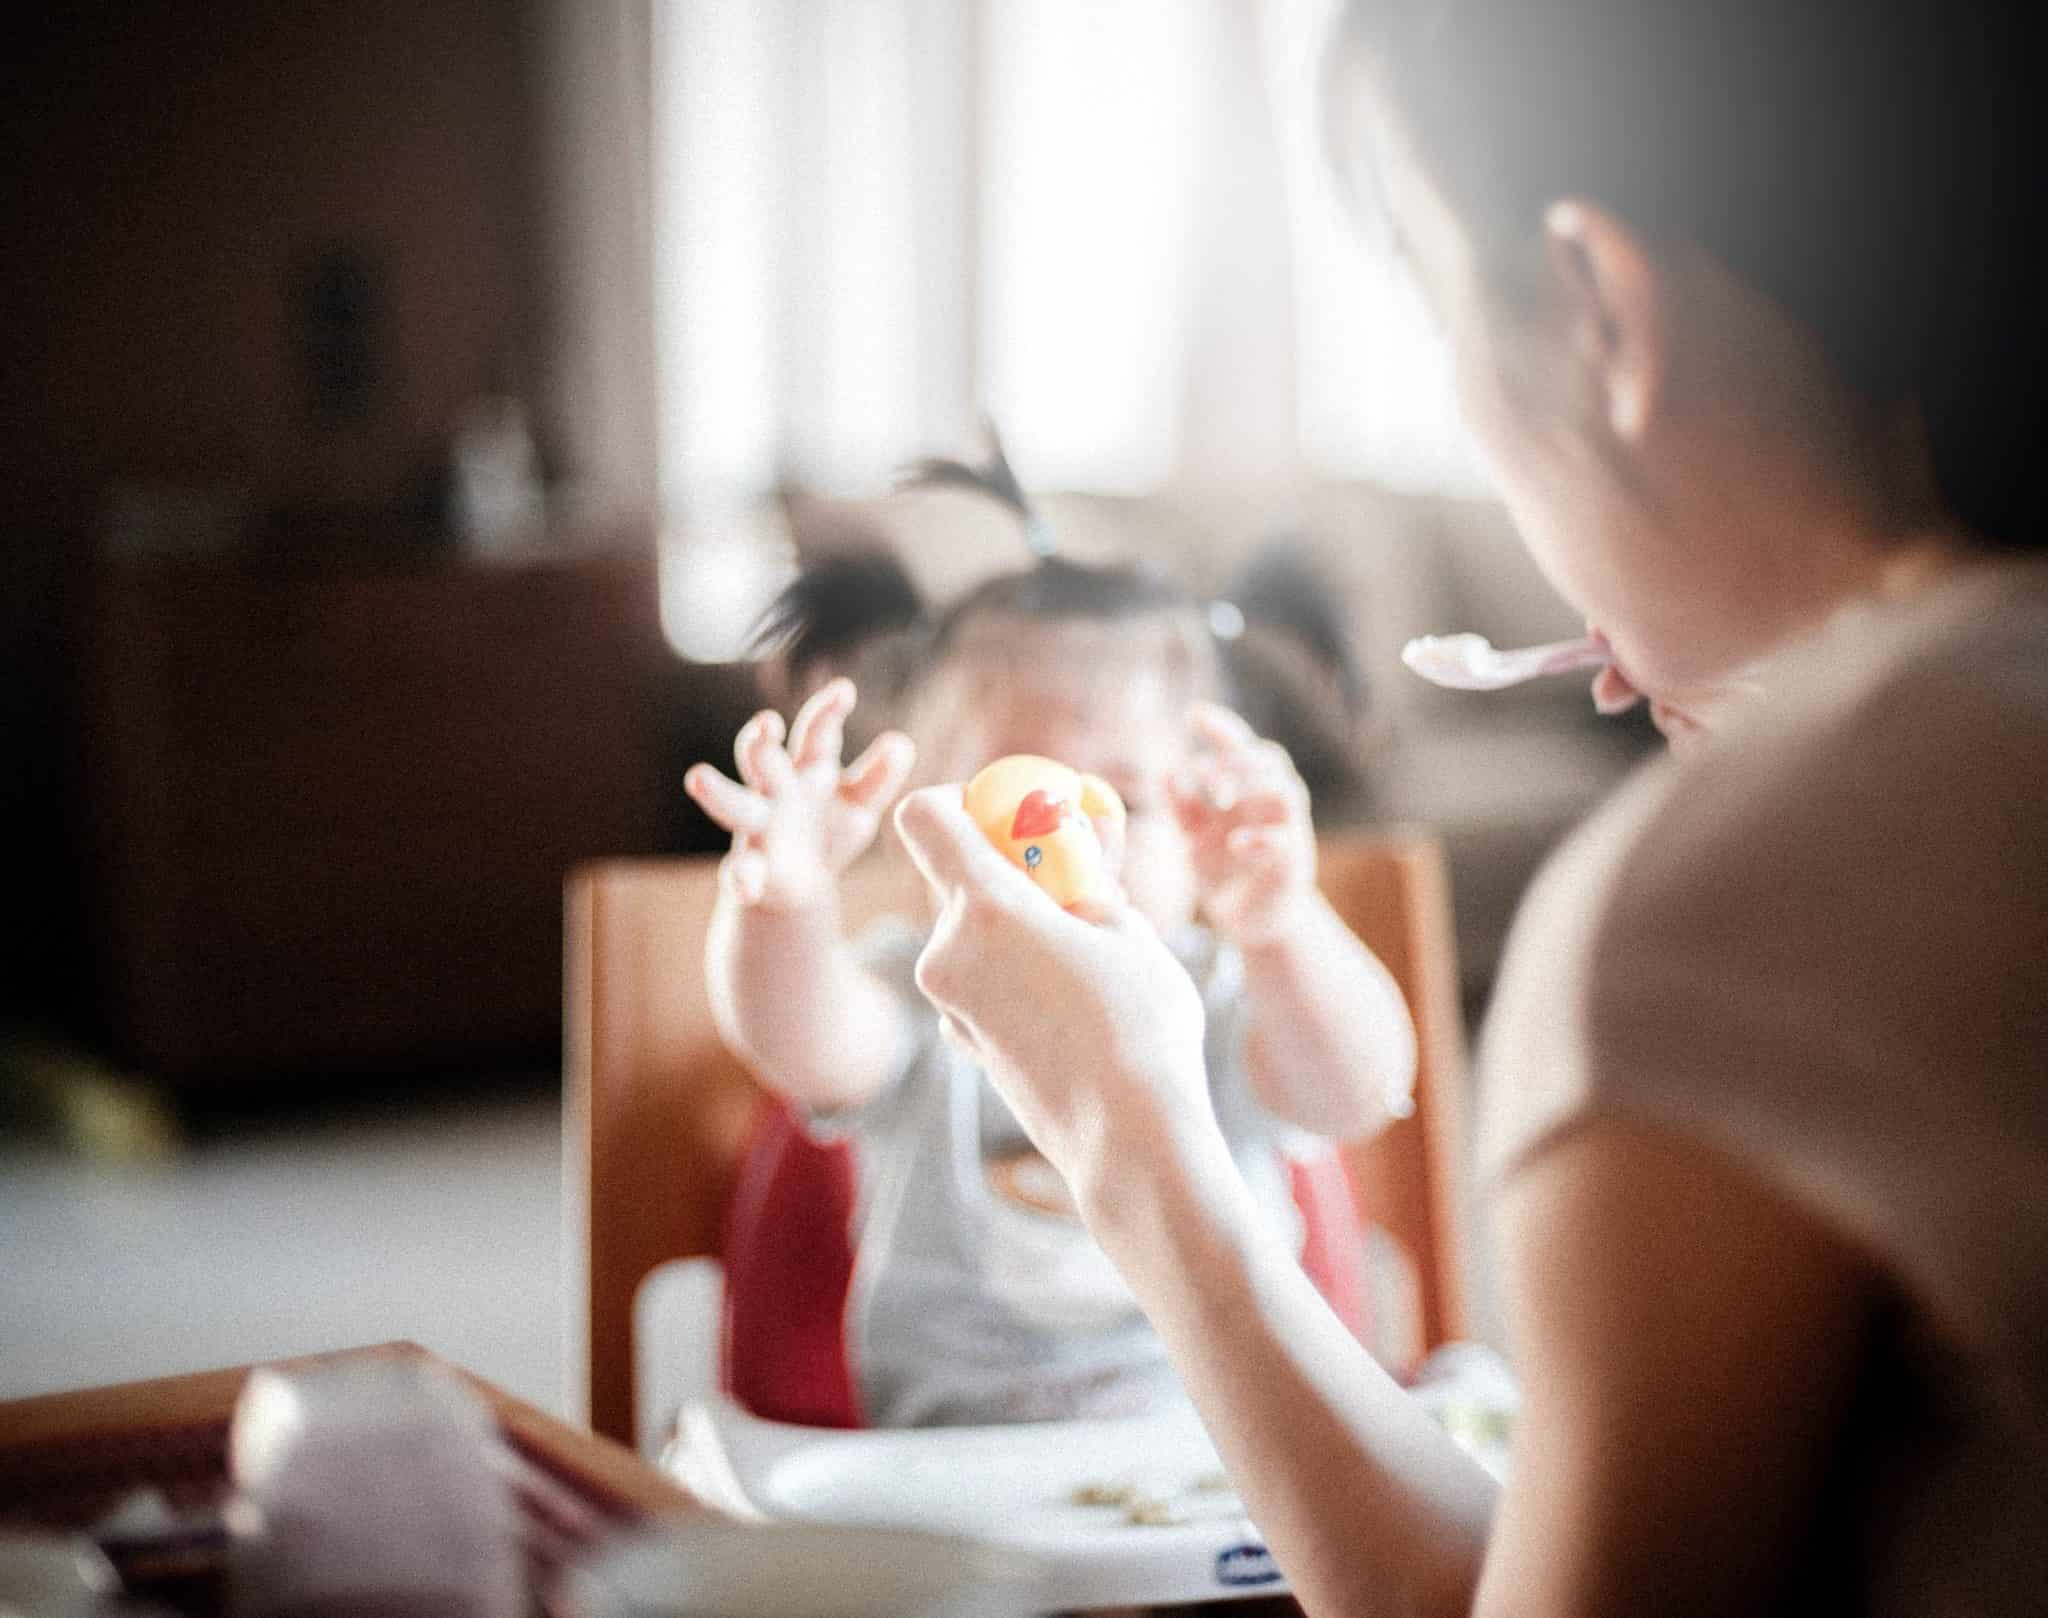 bebe qui joue avec maman Popote